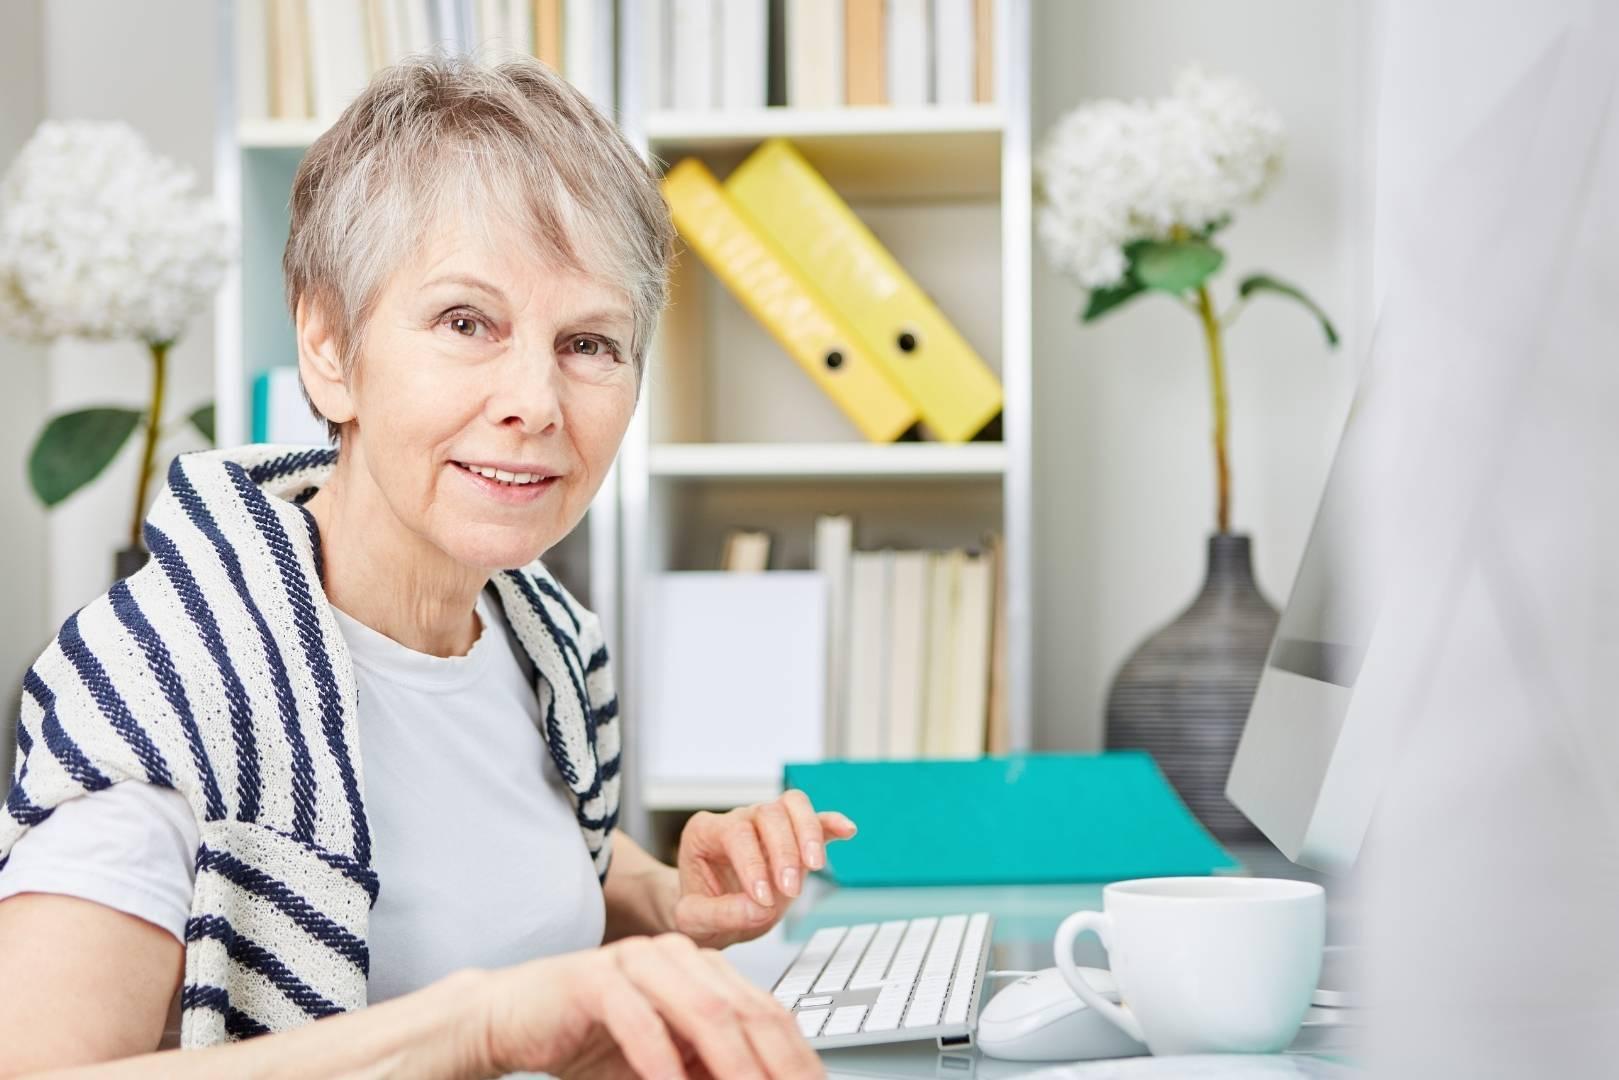 In jedem Alter noch online aktiv